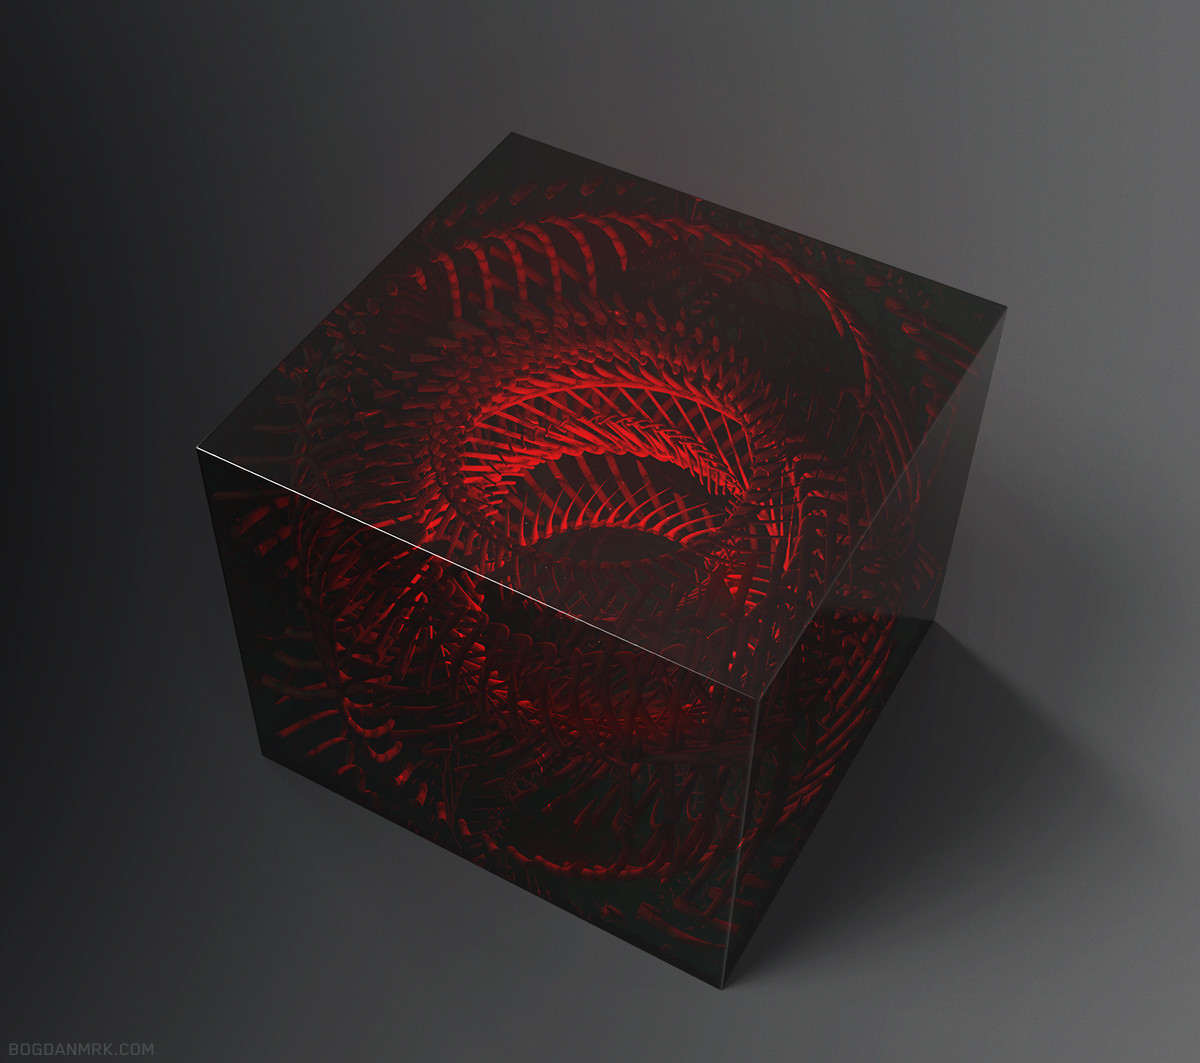 Bogdan marica bogdanmrk cube